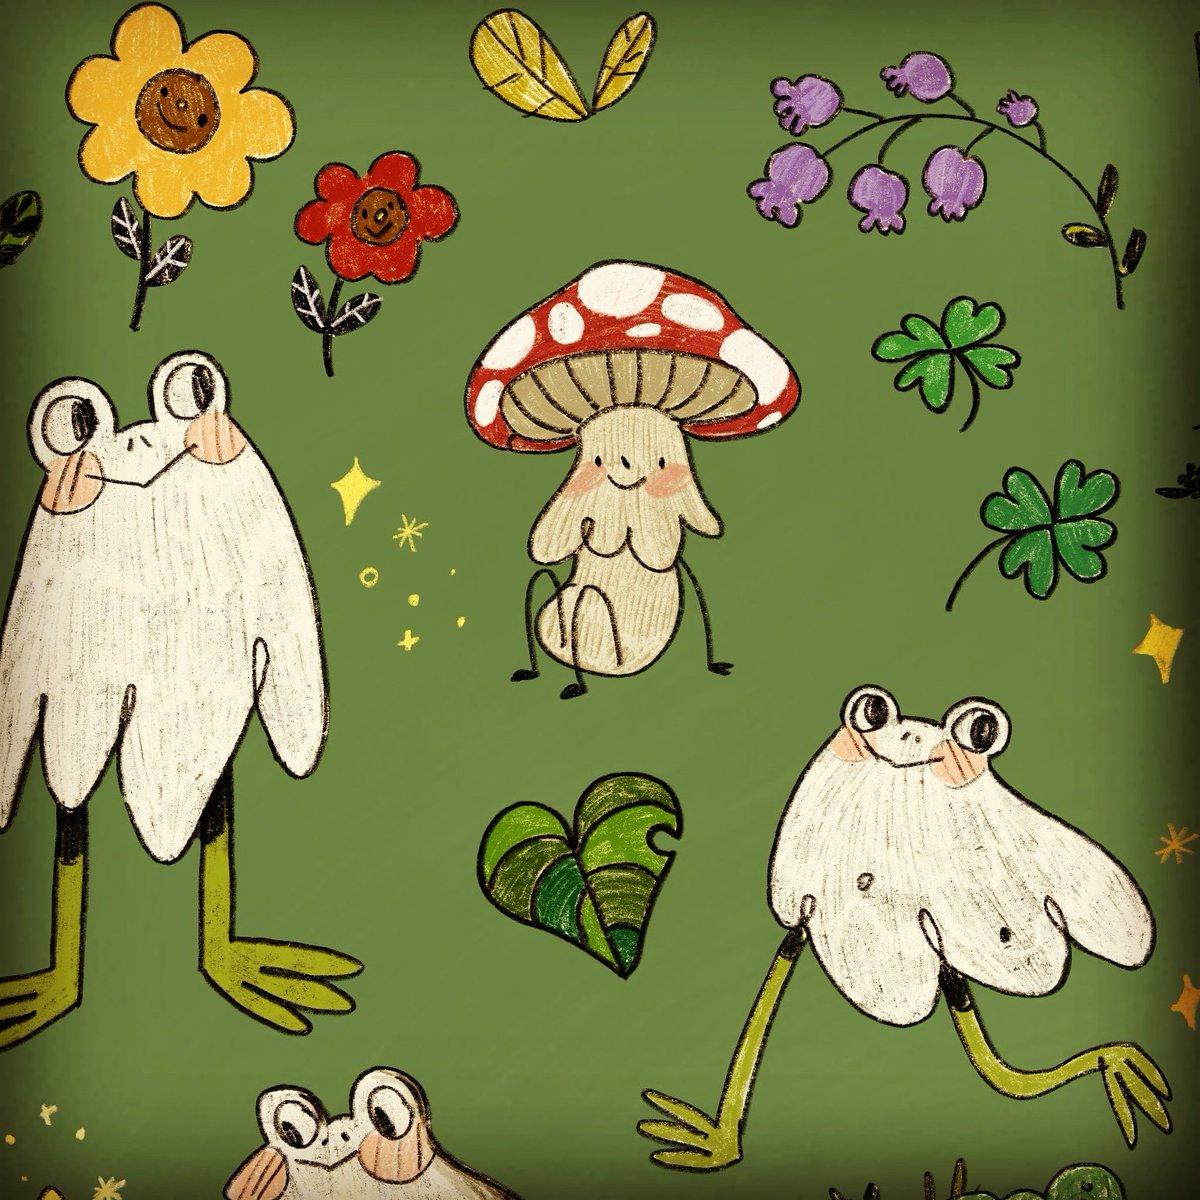 ☆Sticker Sheet in the works!~🐸👻   *  *  *  #illustration #illustratorsofisntstagram #art #artist #artistsoninstagram #illustrator #frogs #frogghost #froghoul #cute #stickers #design #original #originalart #forest #nature  https://t.co/k0PLlzLclI